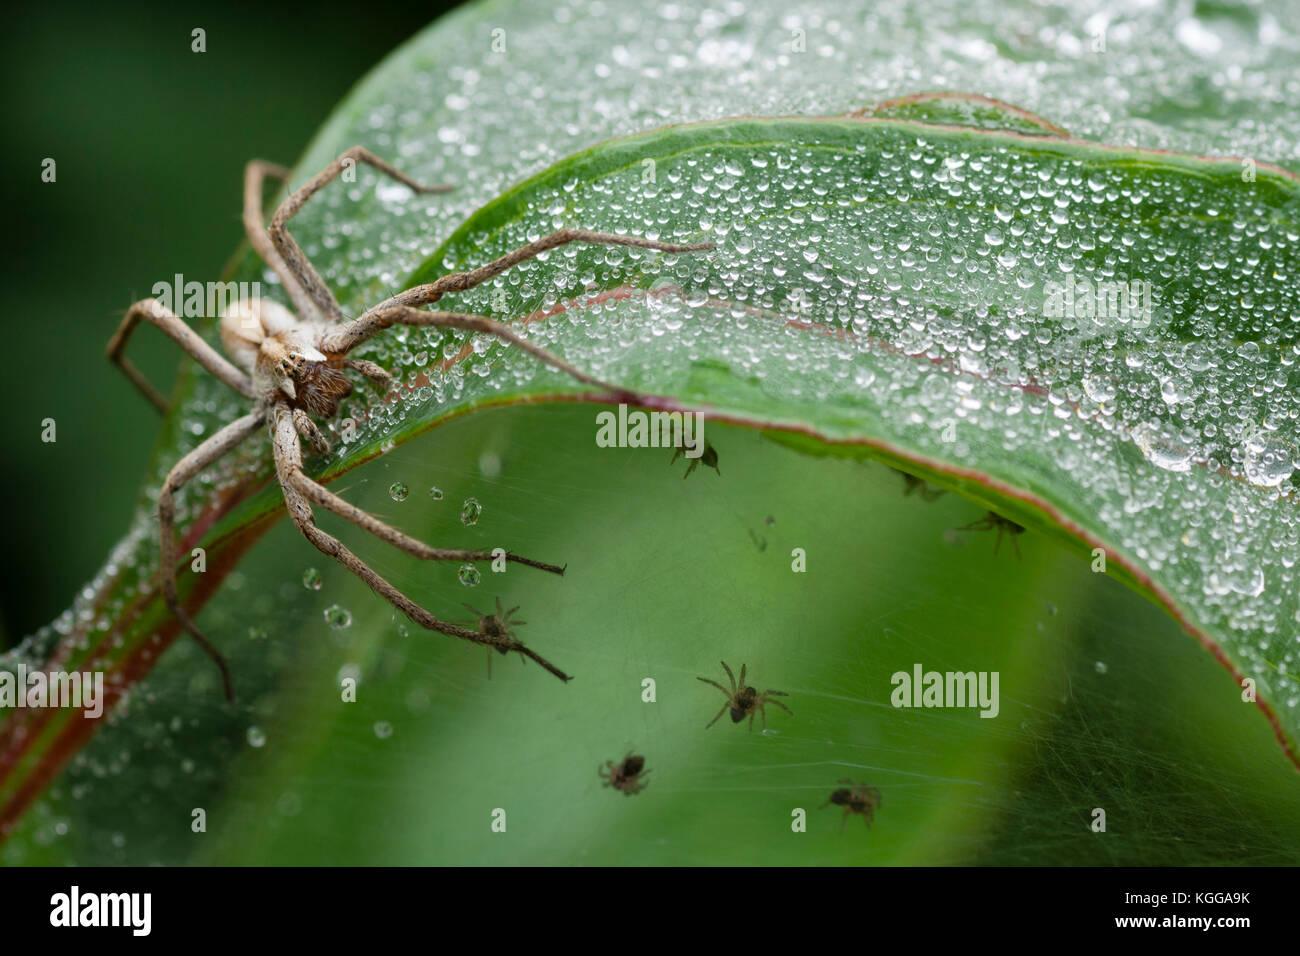 adult-female-nursery-web-spider-pisaura-mirabilis-sitting-on-the-web-KGGA9K.jpg